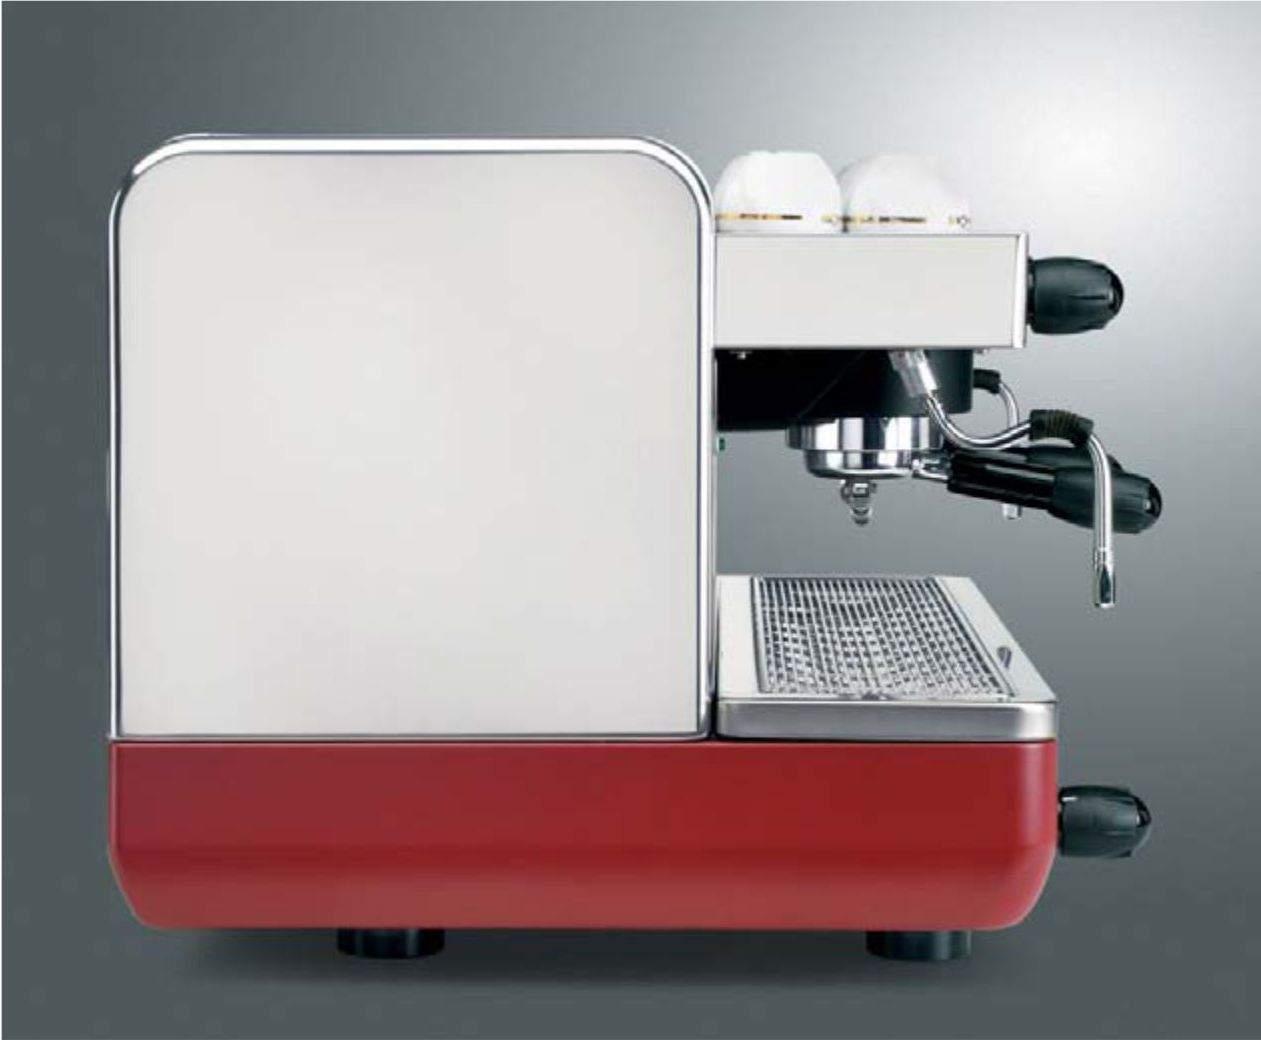 16114 | Кофемашина профессиональная La Cimbali M22 Premium C2 б/у | Coffee Shop